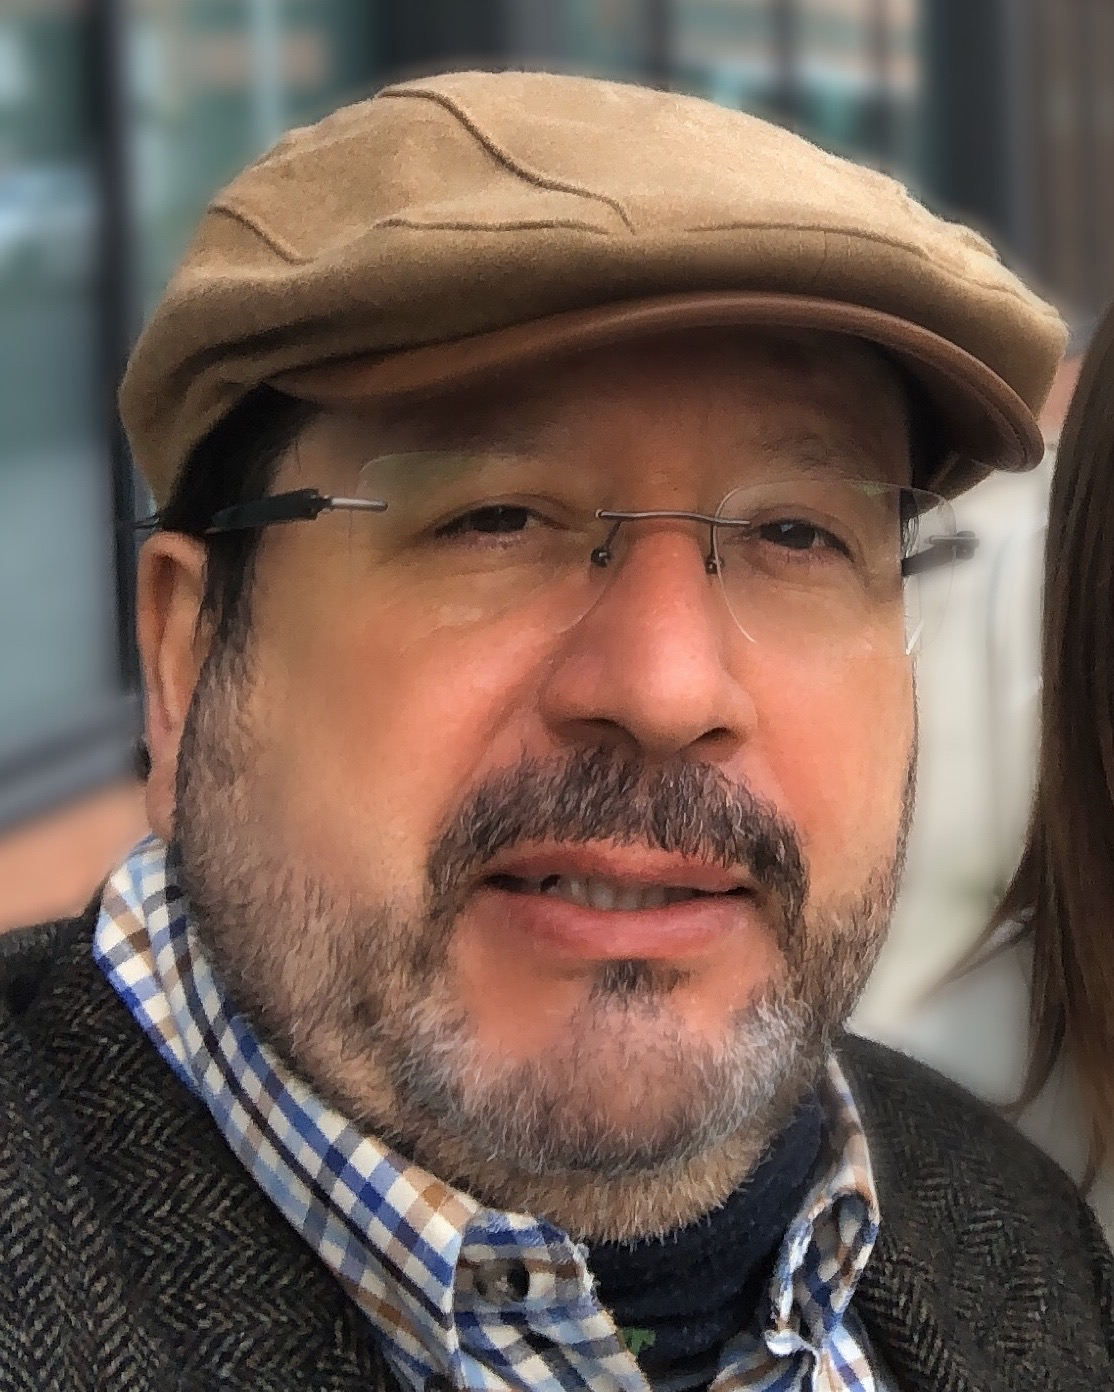 Whats With The New Lazo In Fortnite Prof Bernardo Batiz Lazo